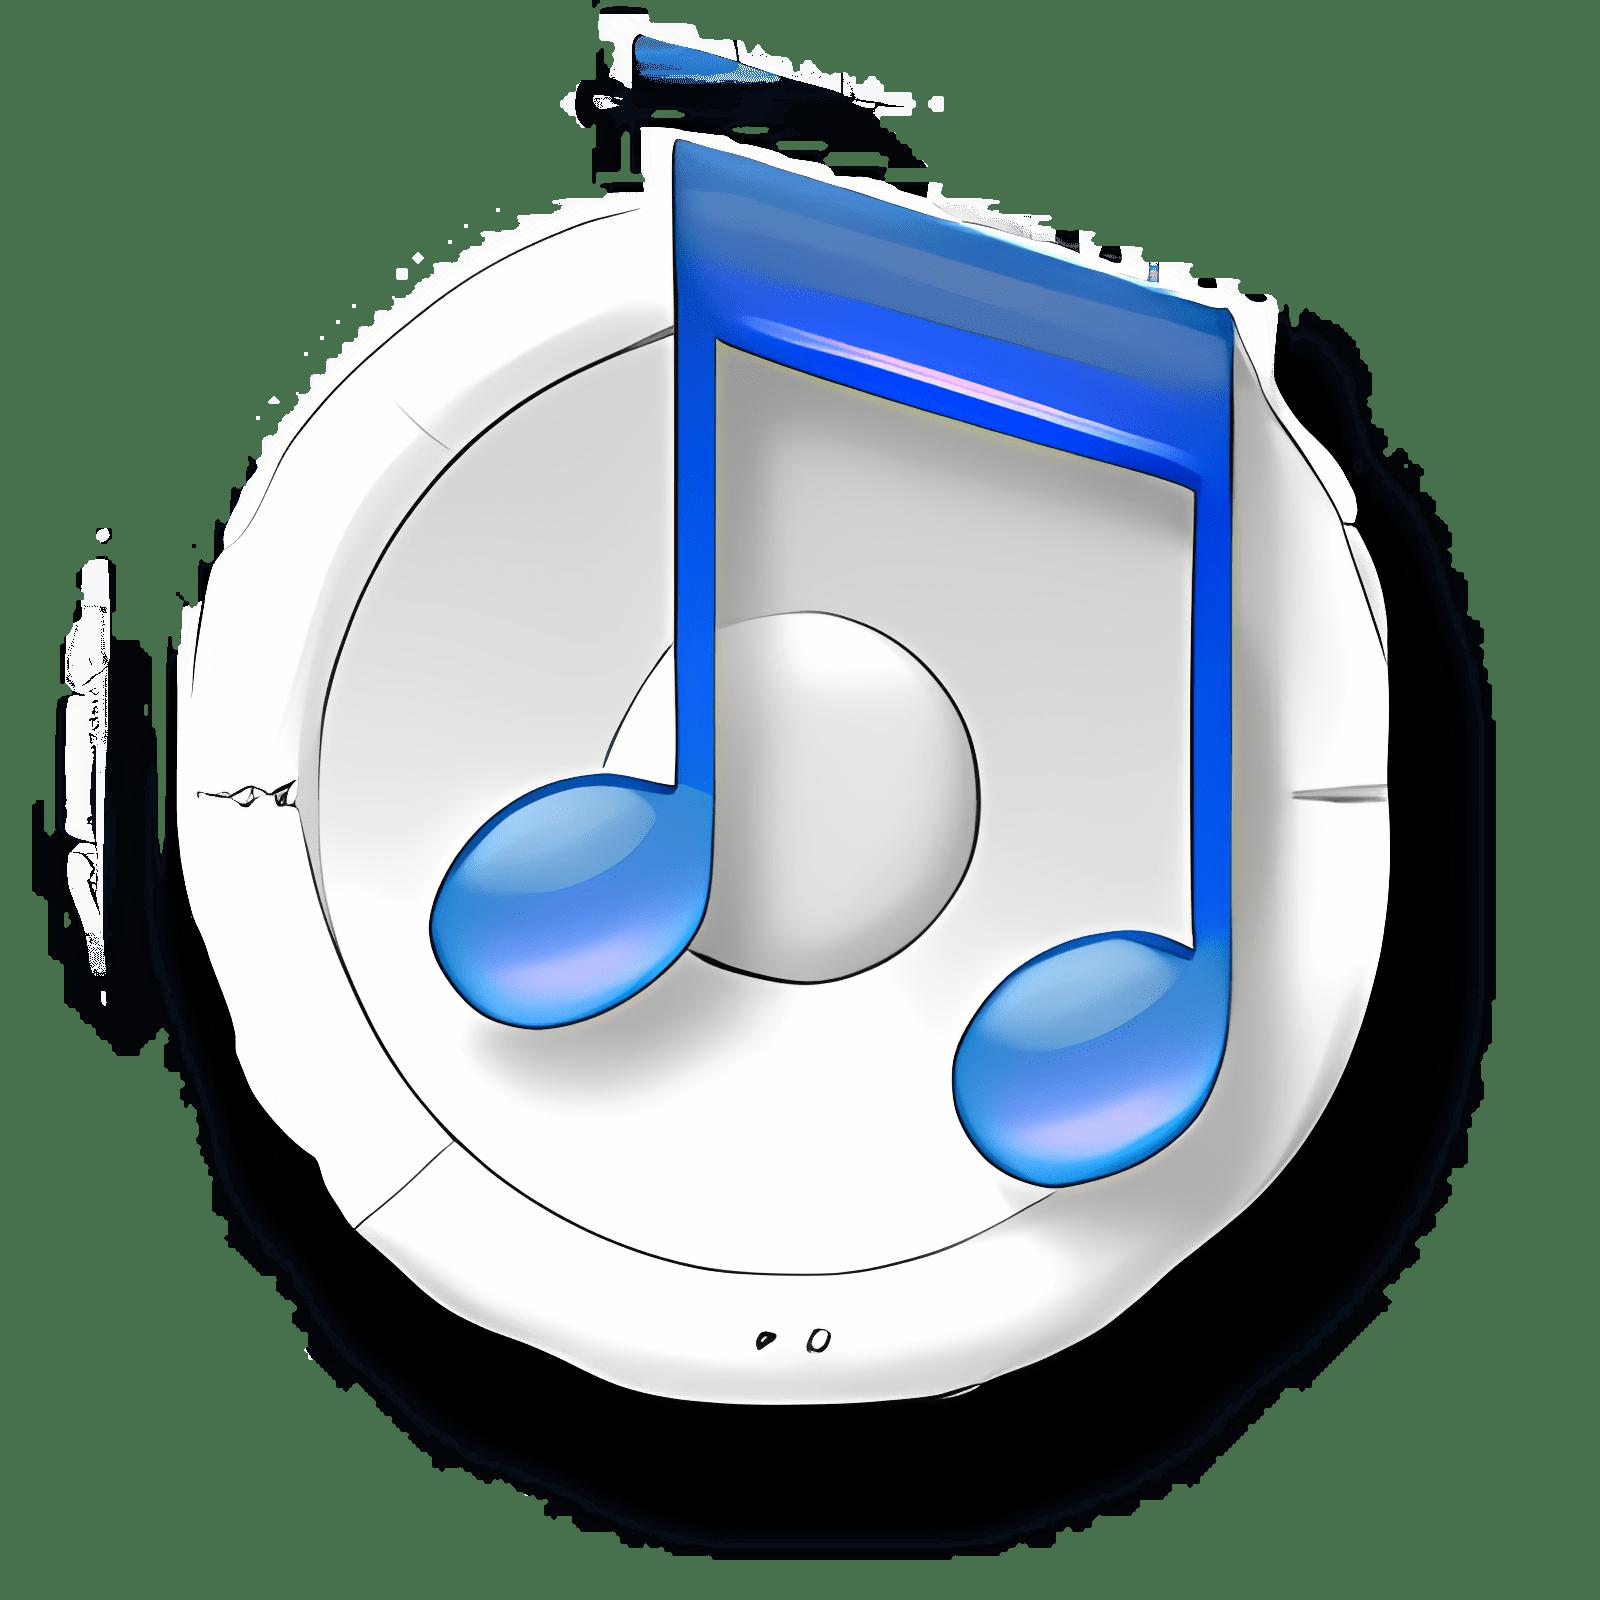 iPod.iTunes